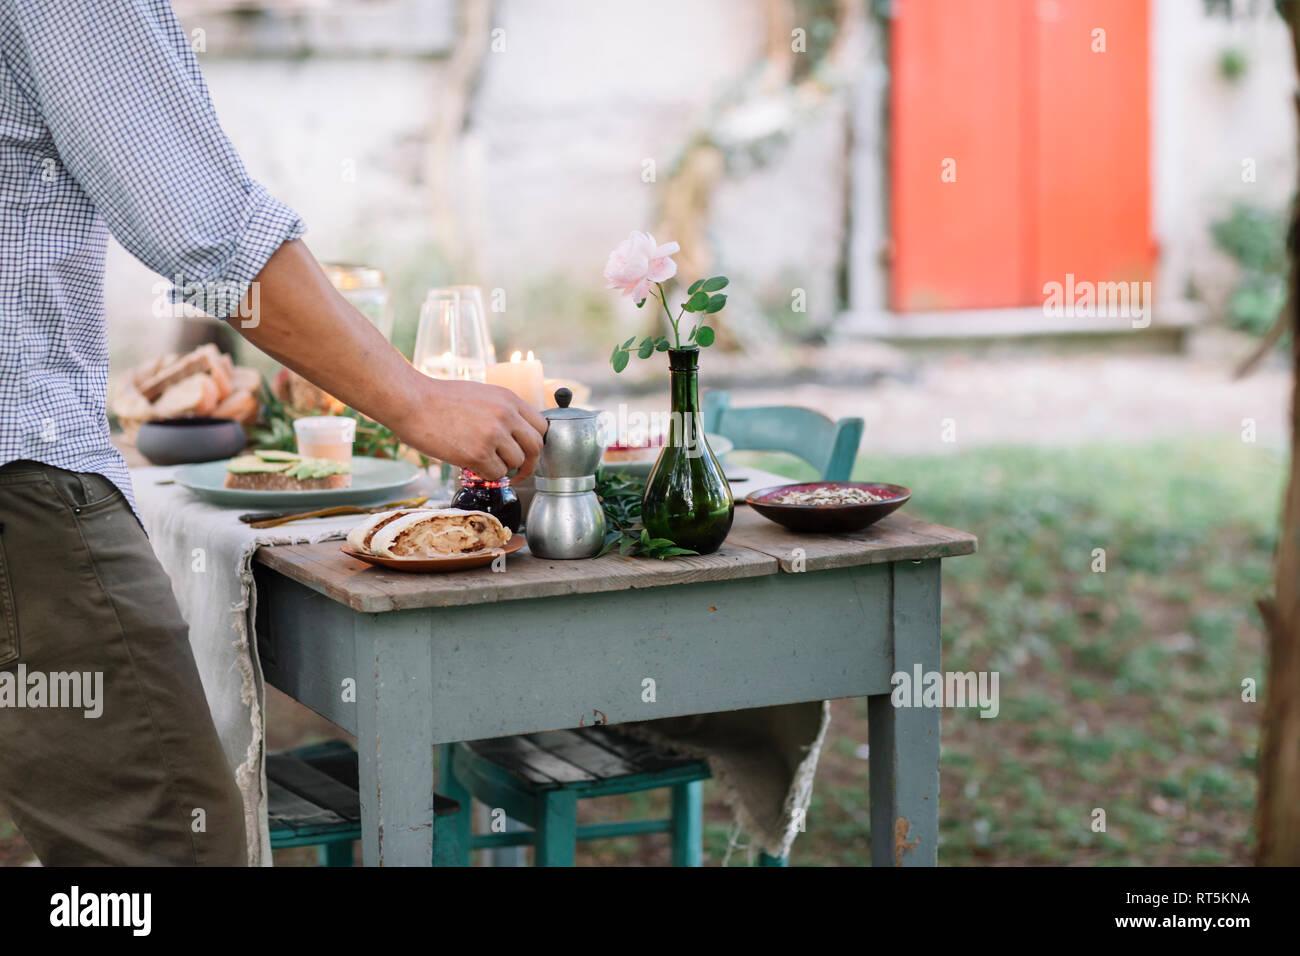 Close-up of man taking moka pot from garden table - Stock Image